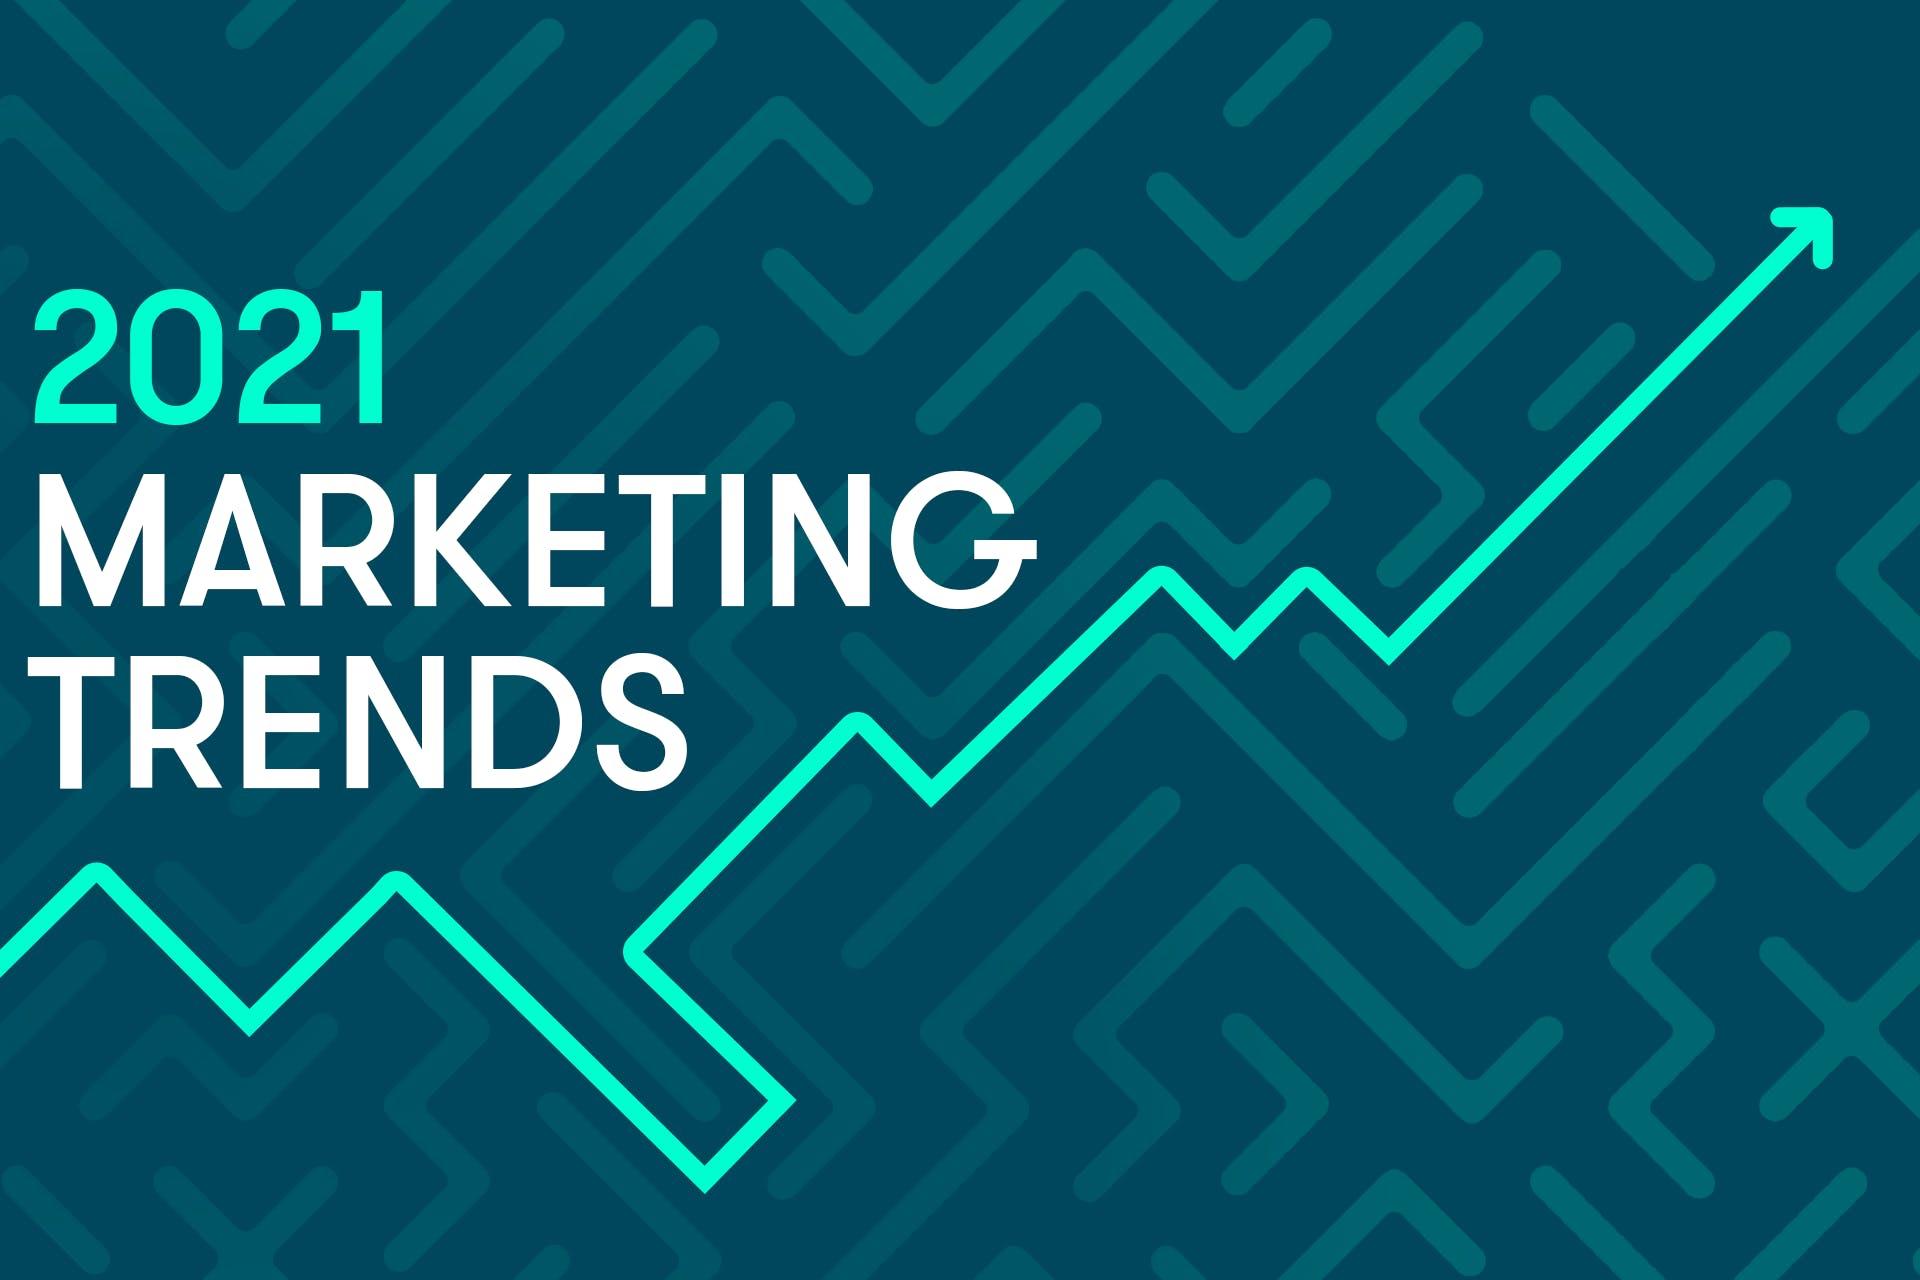 2021 marketing trends